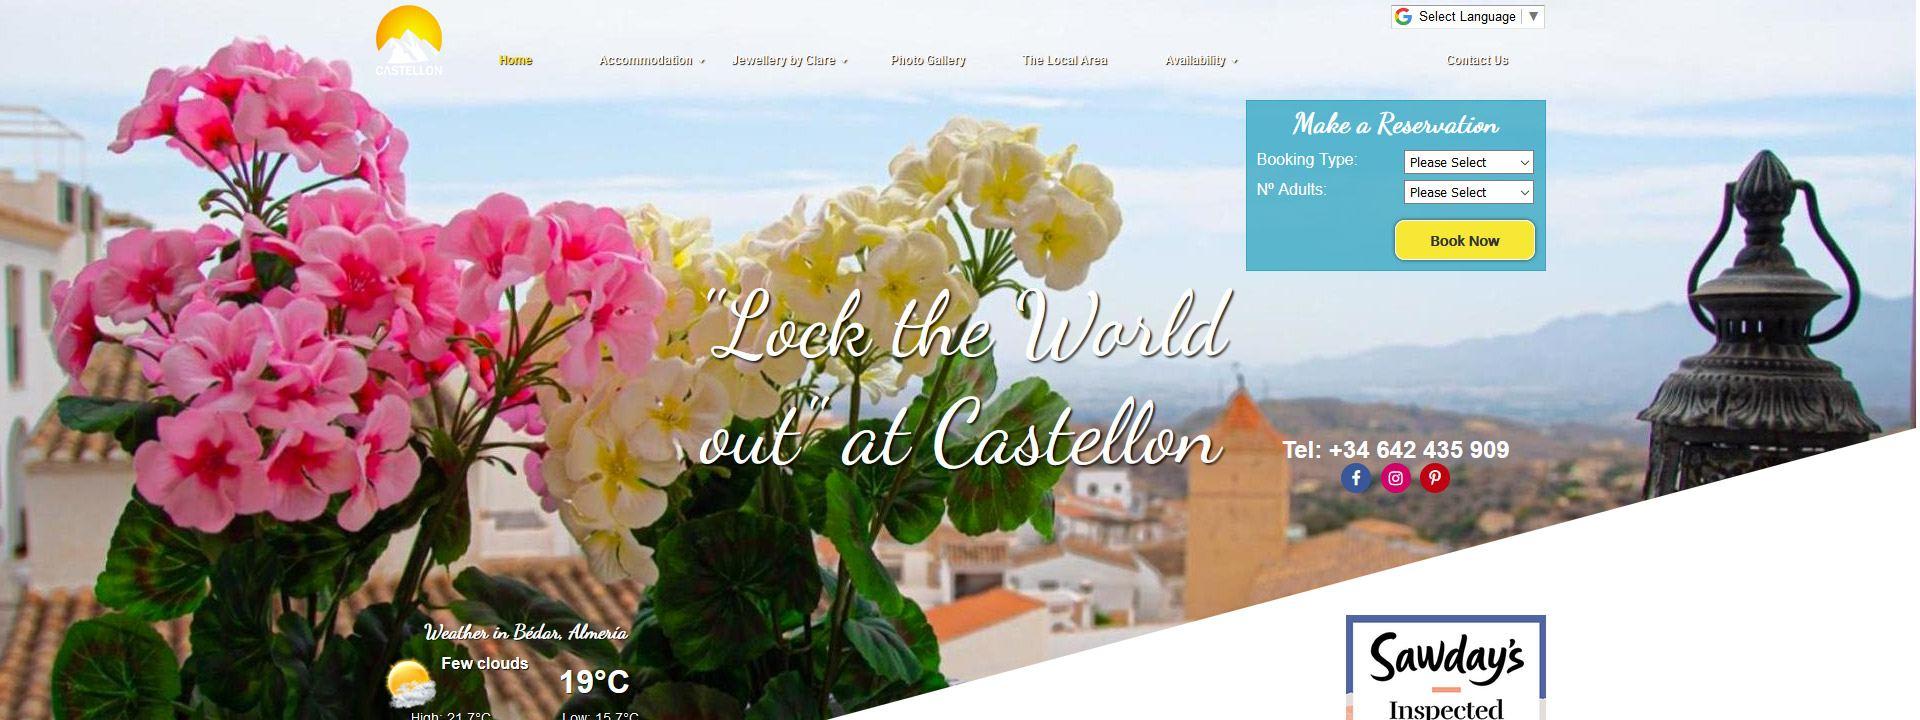 Guest House Websites